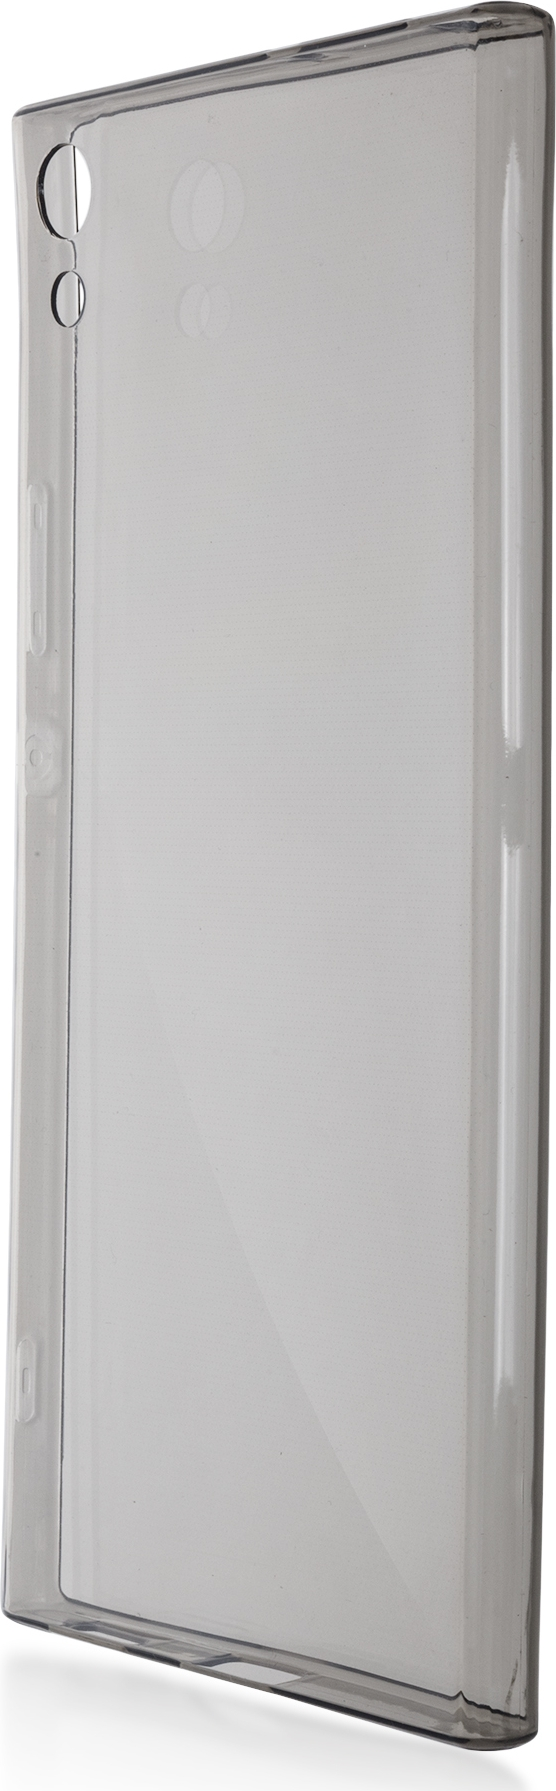 Чехол Brosco TPU для Sony Xperia XA1 Ultra, черный